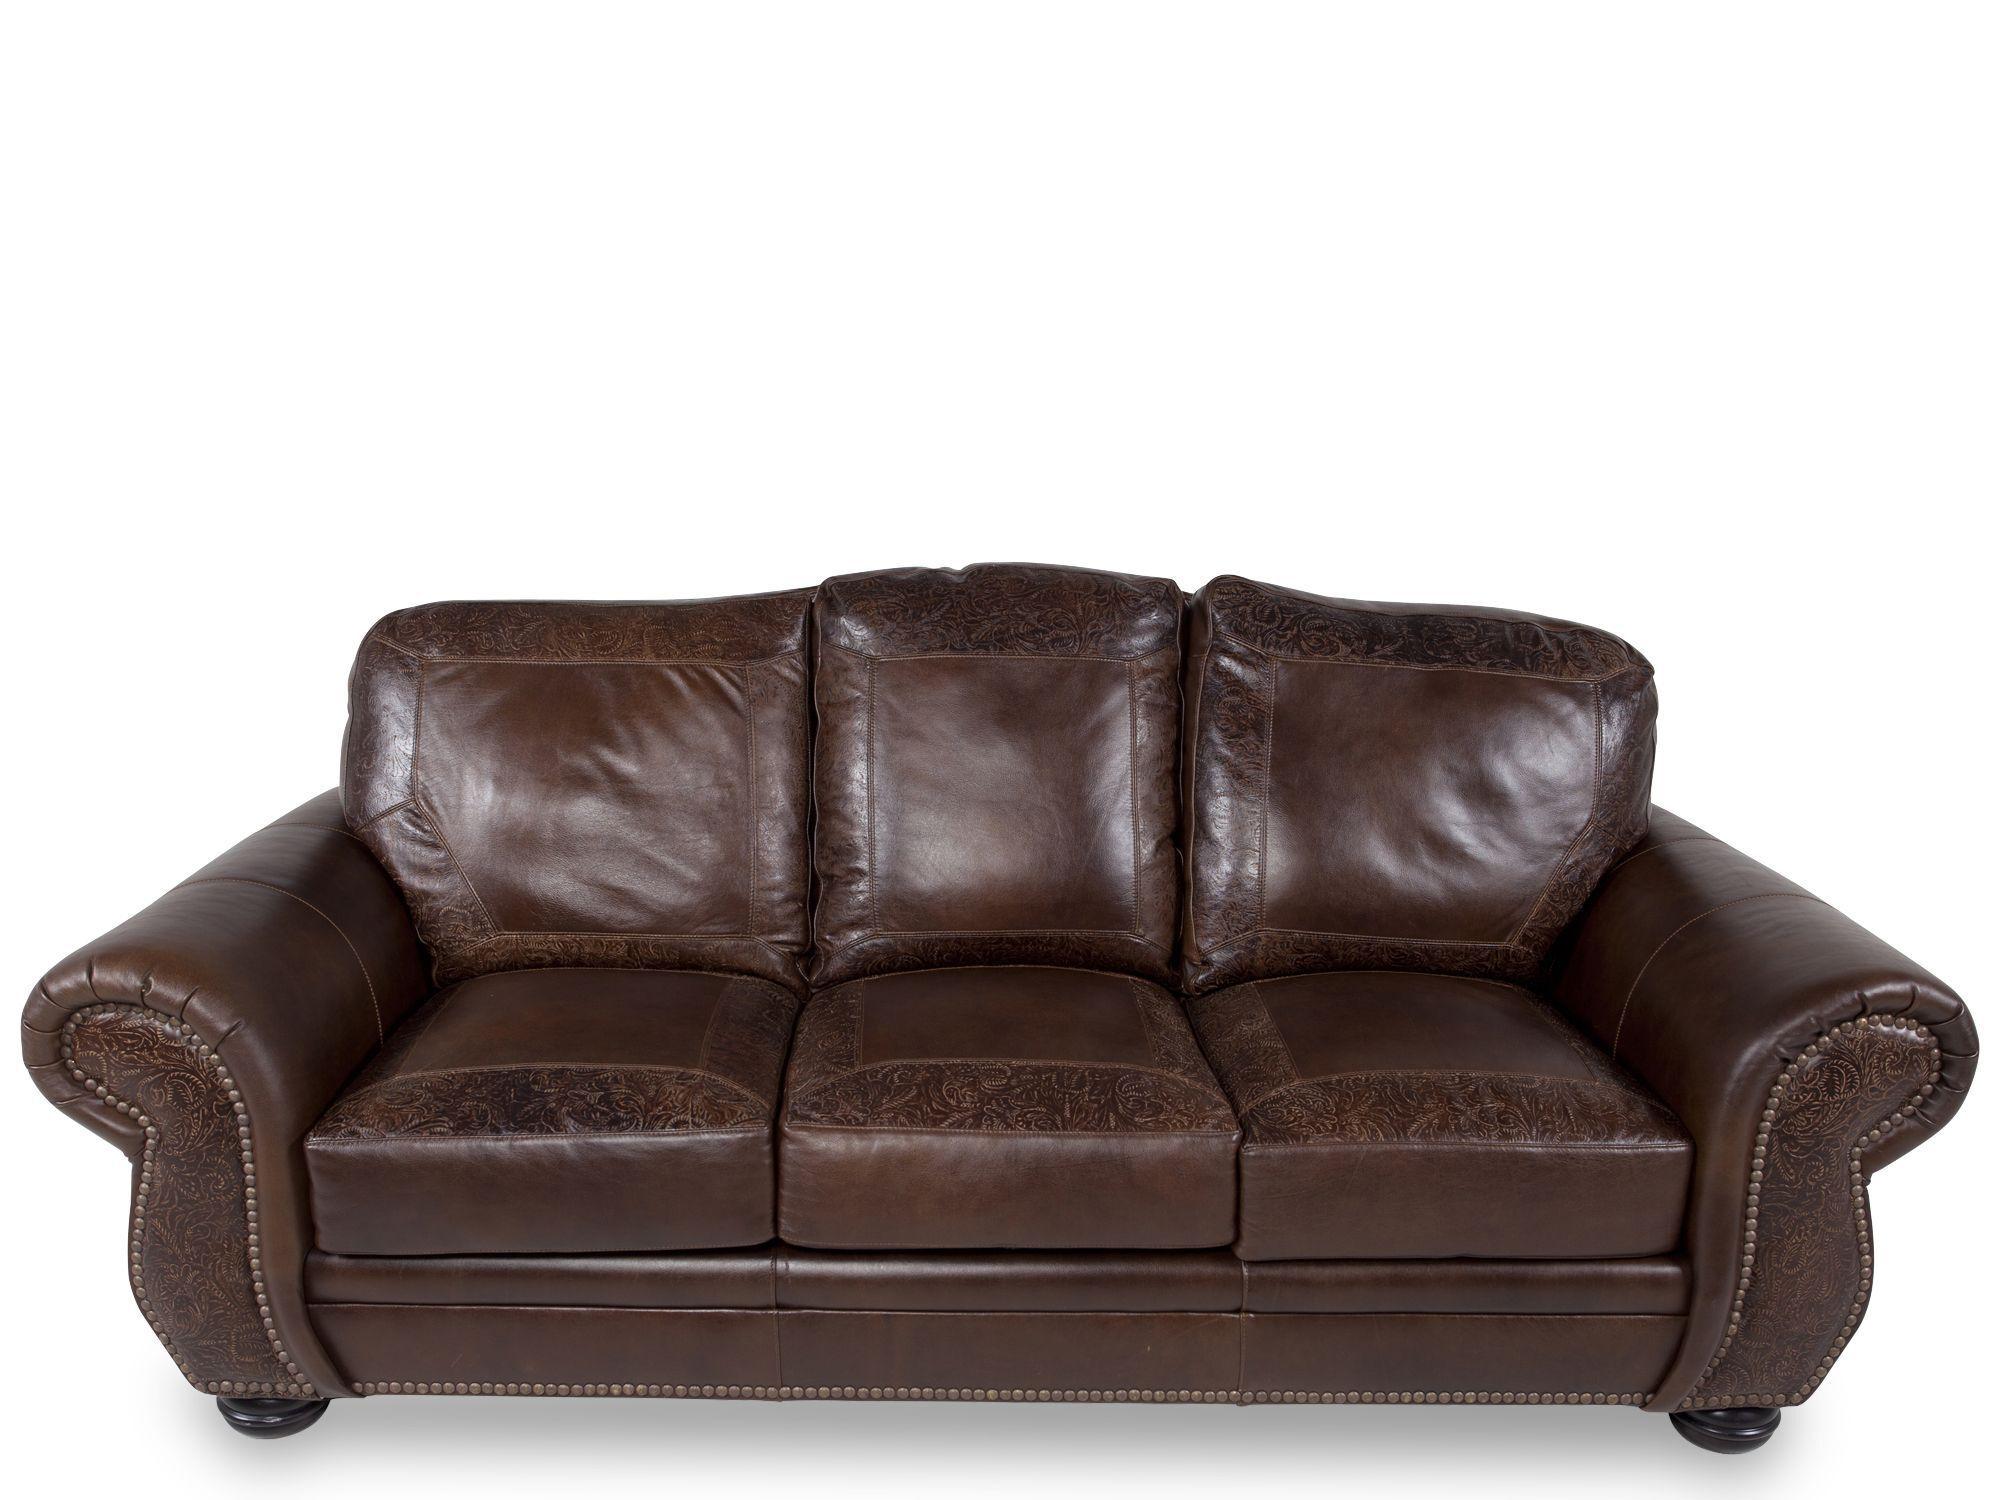 Images Paisley Printed Leather 94u0026quot; Sofa In Dark Burgundy Paisley Printed  Leather 94u0026quot; Sofa In Dark Burgundy